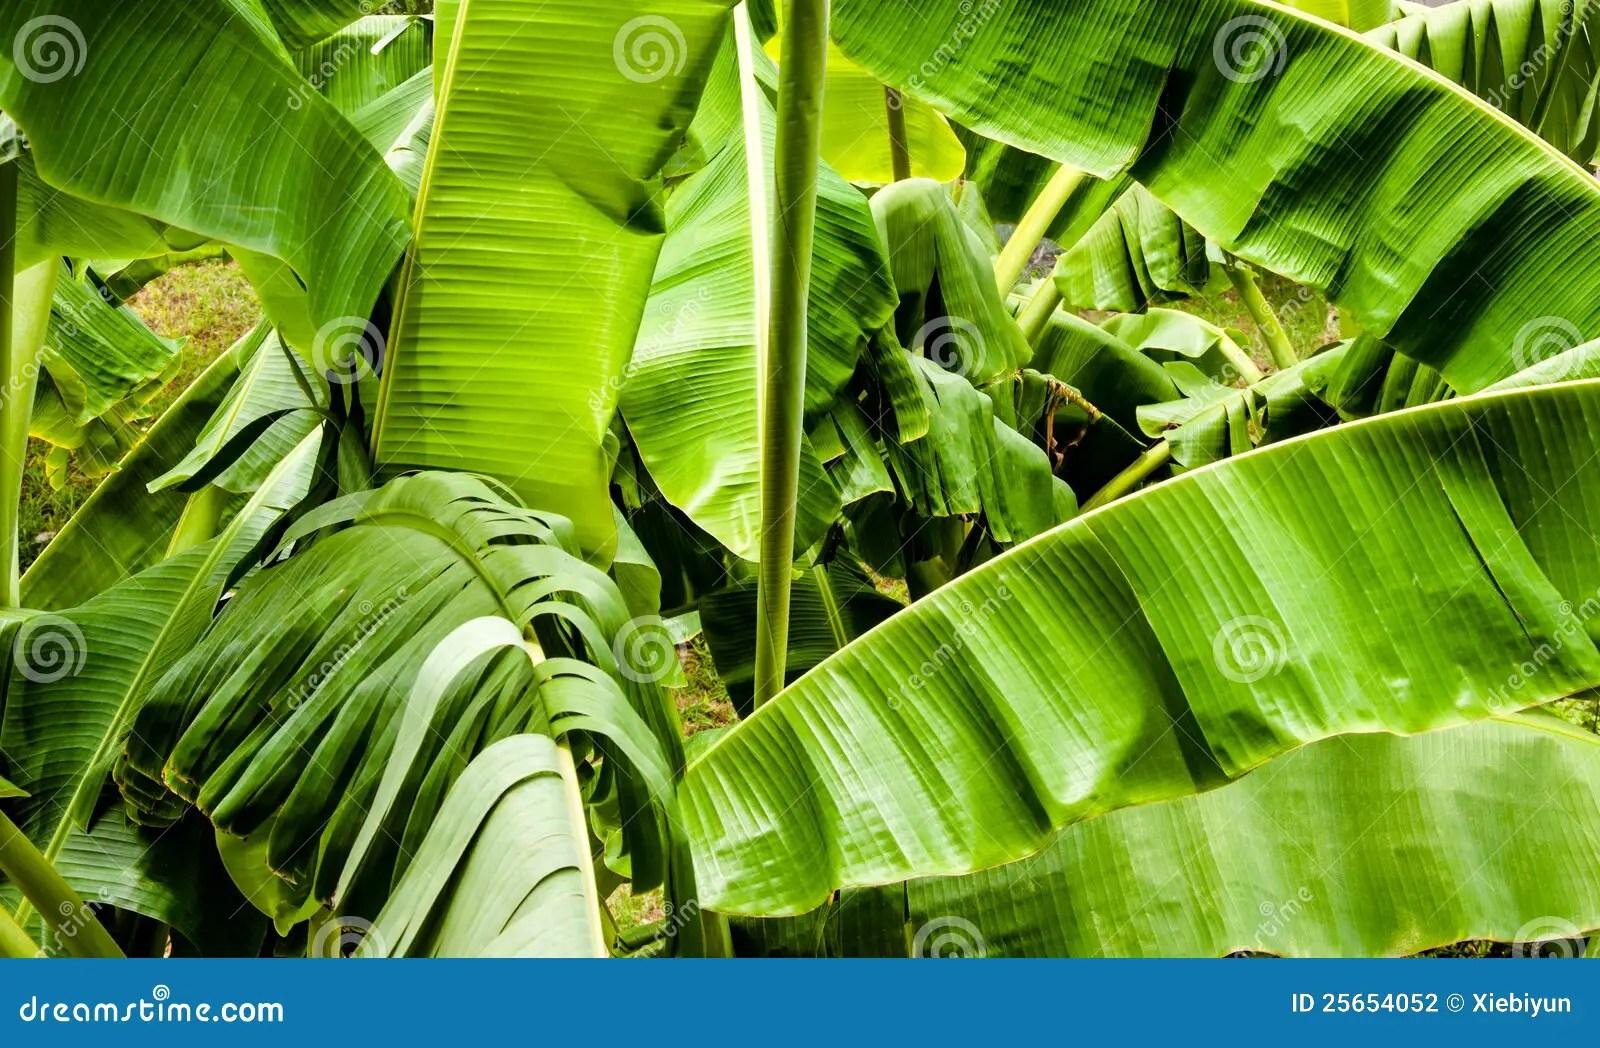 Fall Season Wallpaper Free Banana Tree Leaves Stock Photo Image Of Crop Botanical